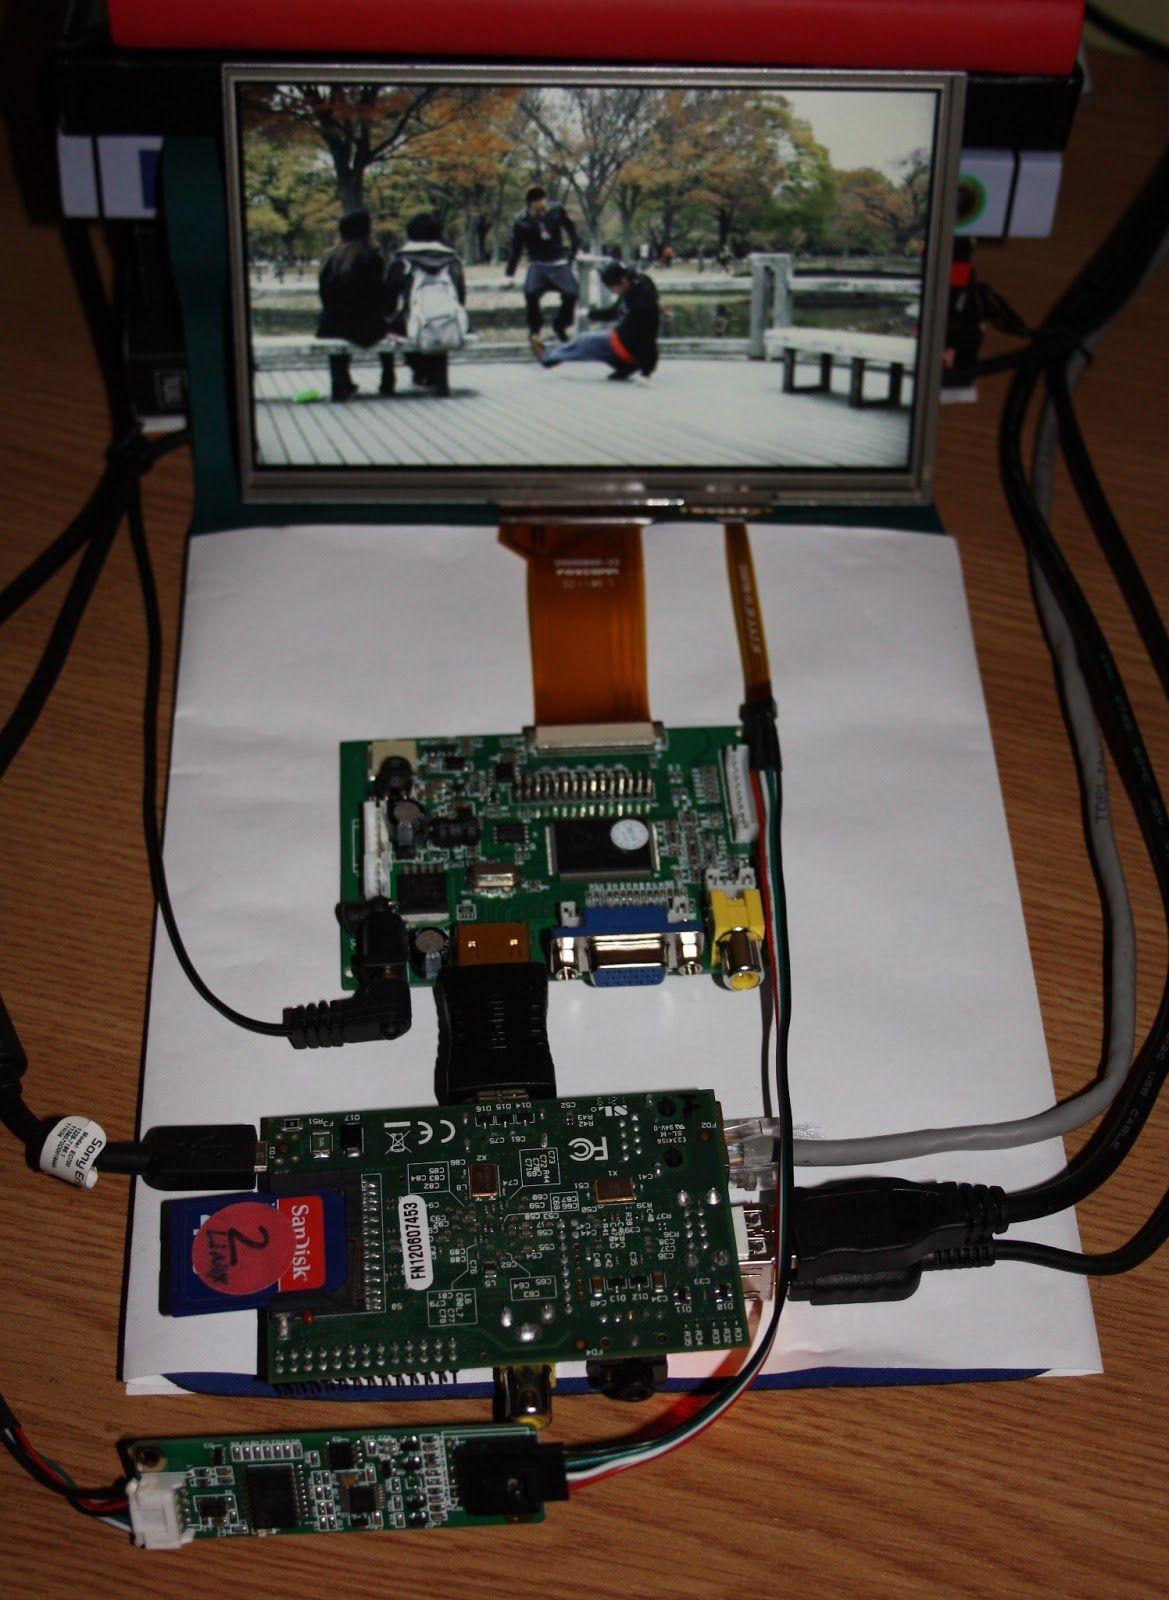 Raspberry PI, Raspbian, XBMC and eGalax 7 inch touchscreen